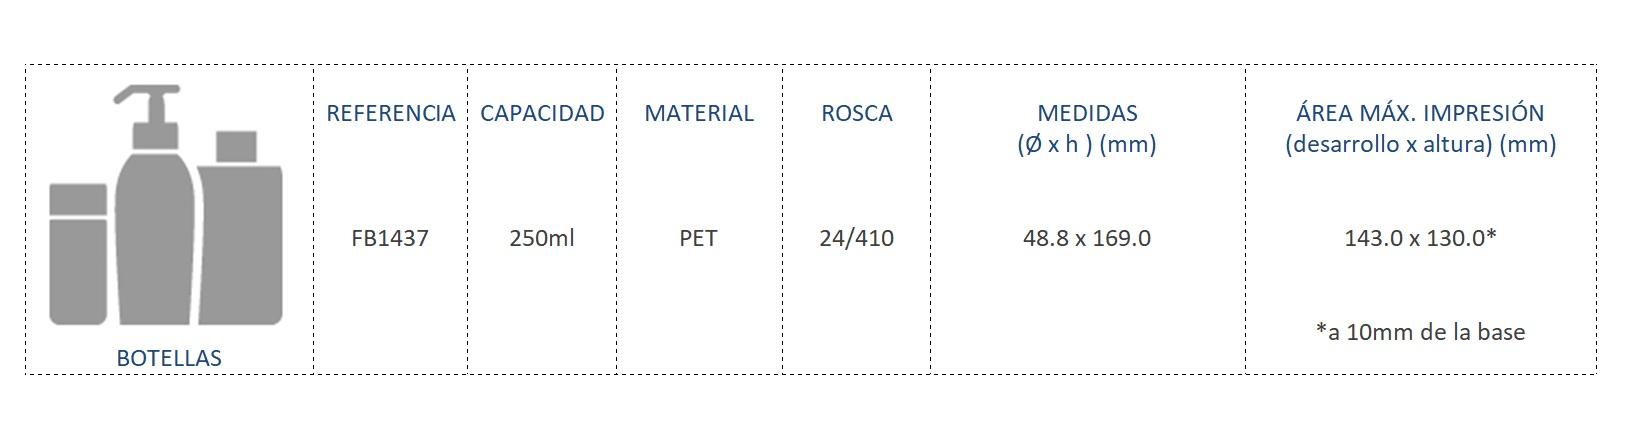 Cuadro de materiales botella FB1437